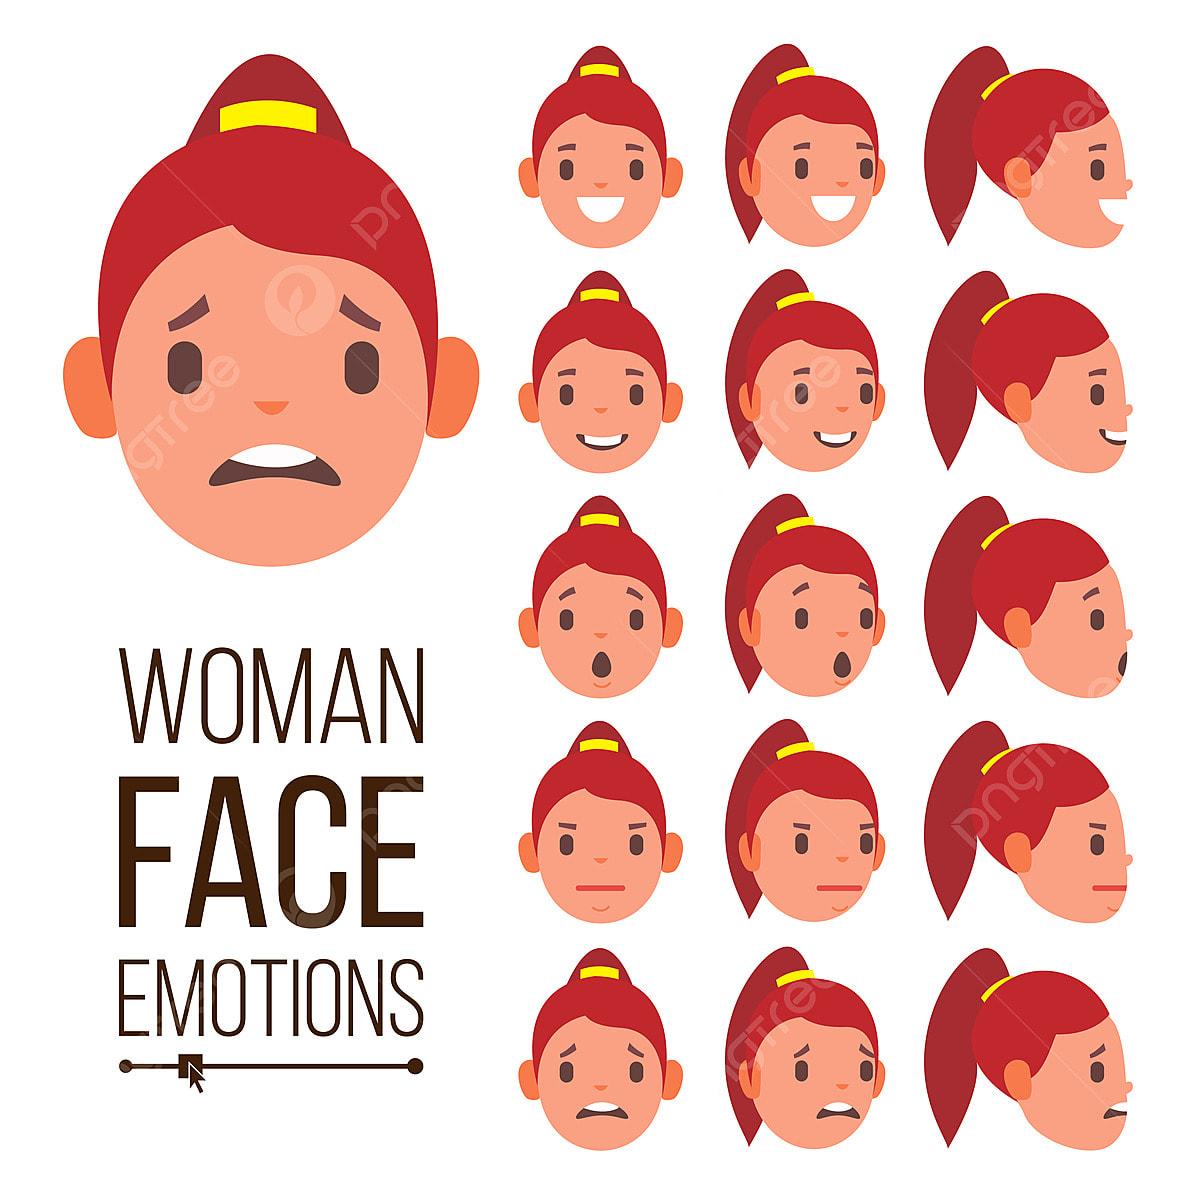 Emosi Wanita Vektor Wajah Tampan Wanita Lucu Kegembiraan